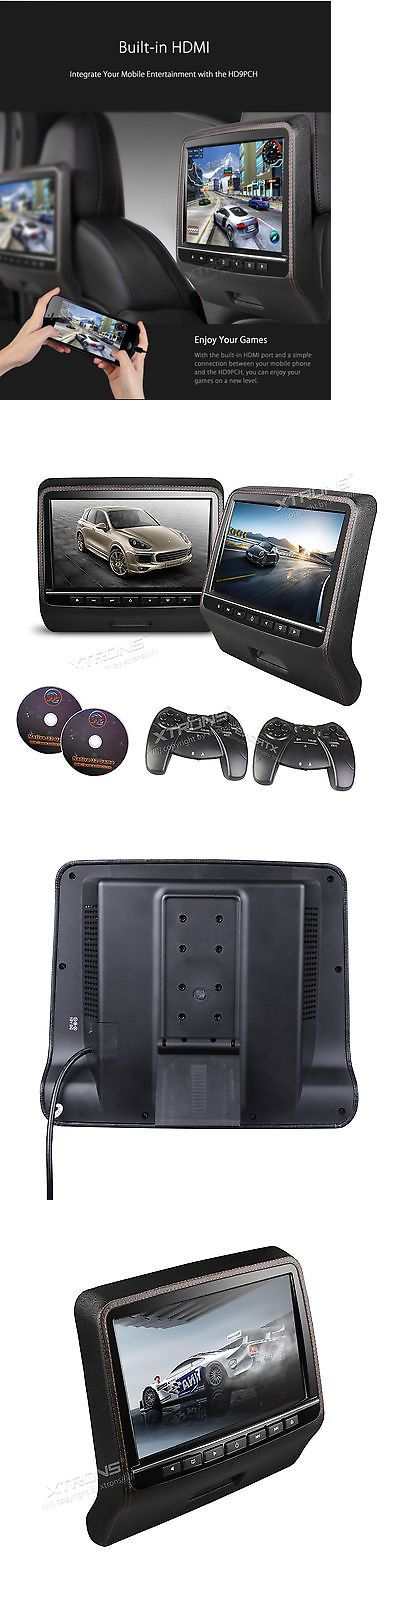 7 Ultra thin Car Headrest Monitors w DVD Player USB HDMI+Games Gray Monitor